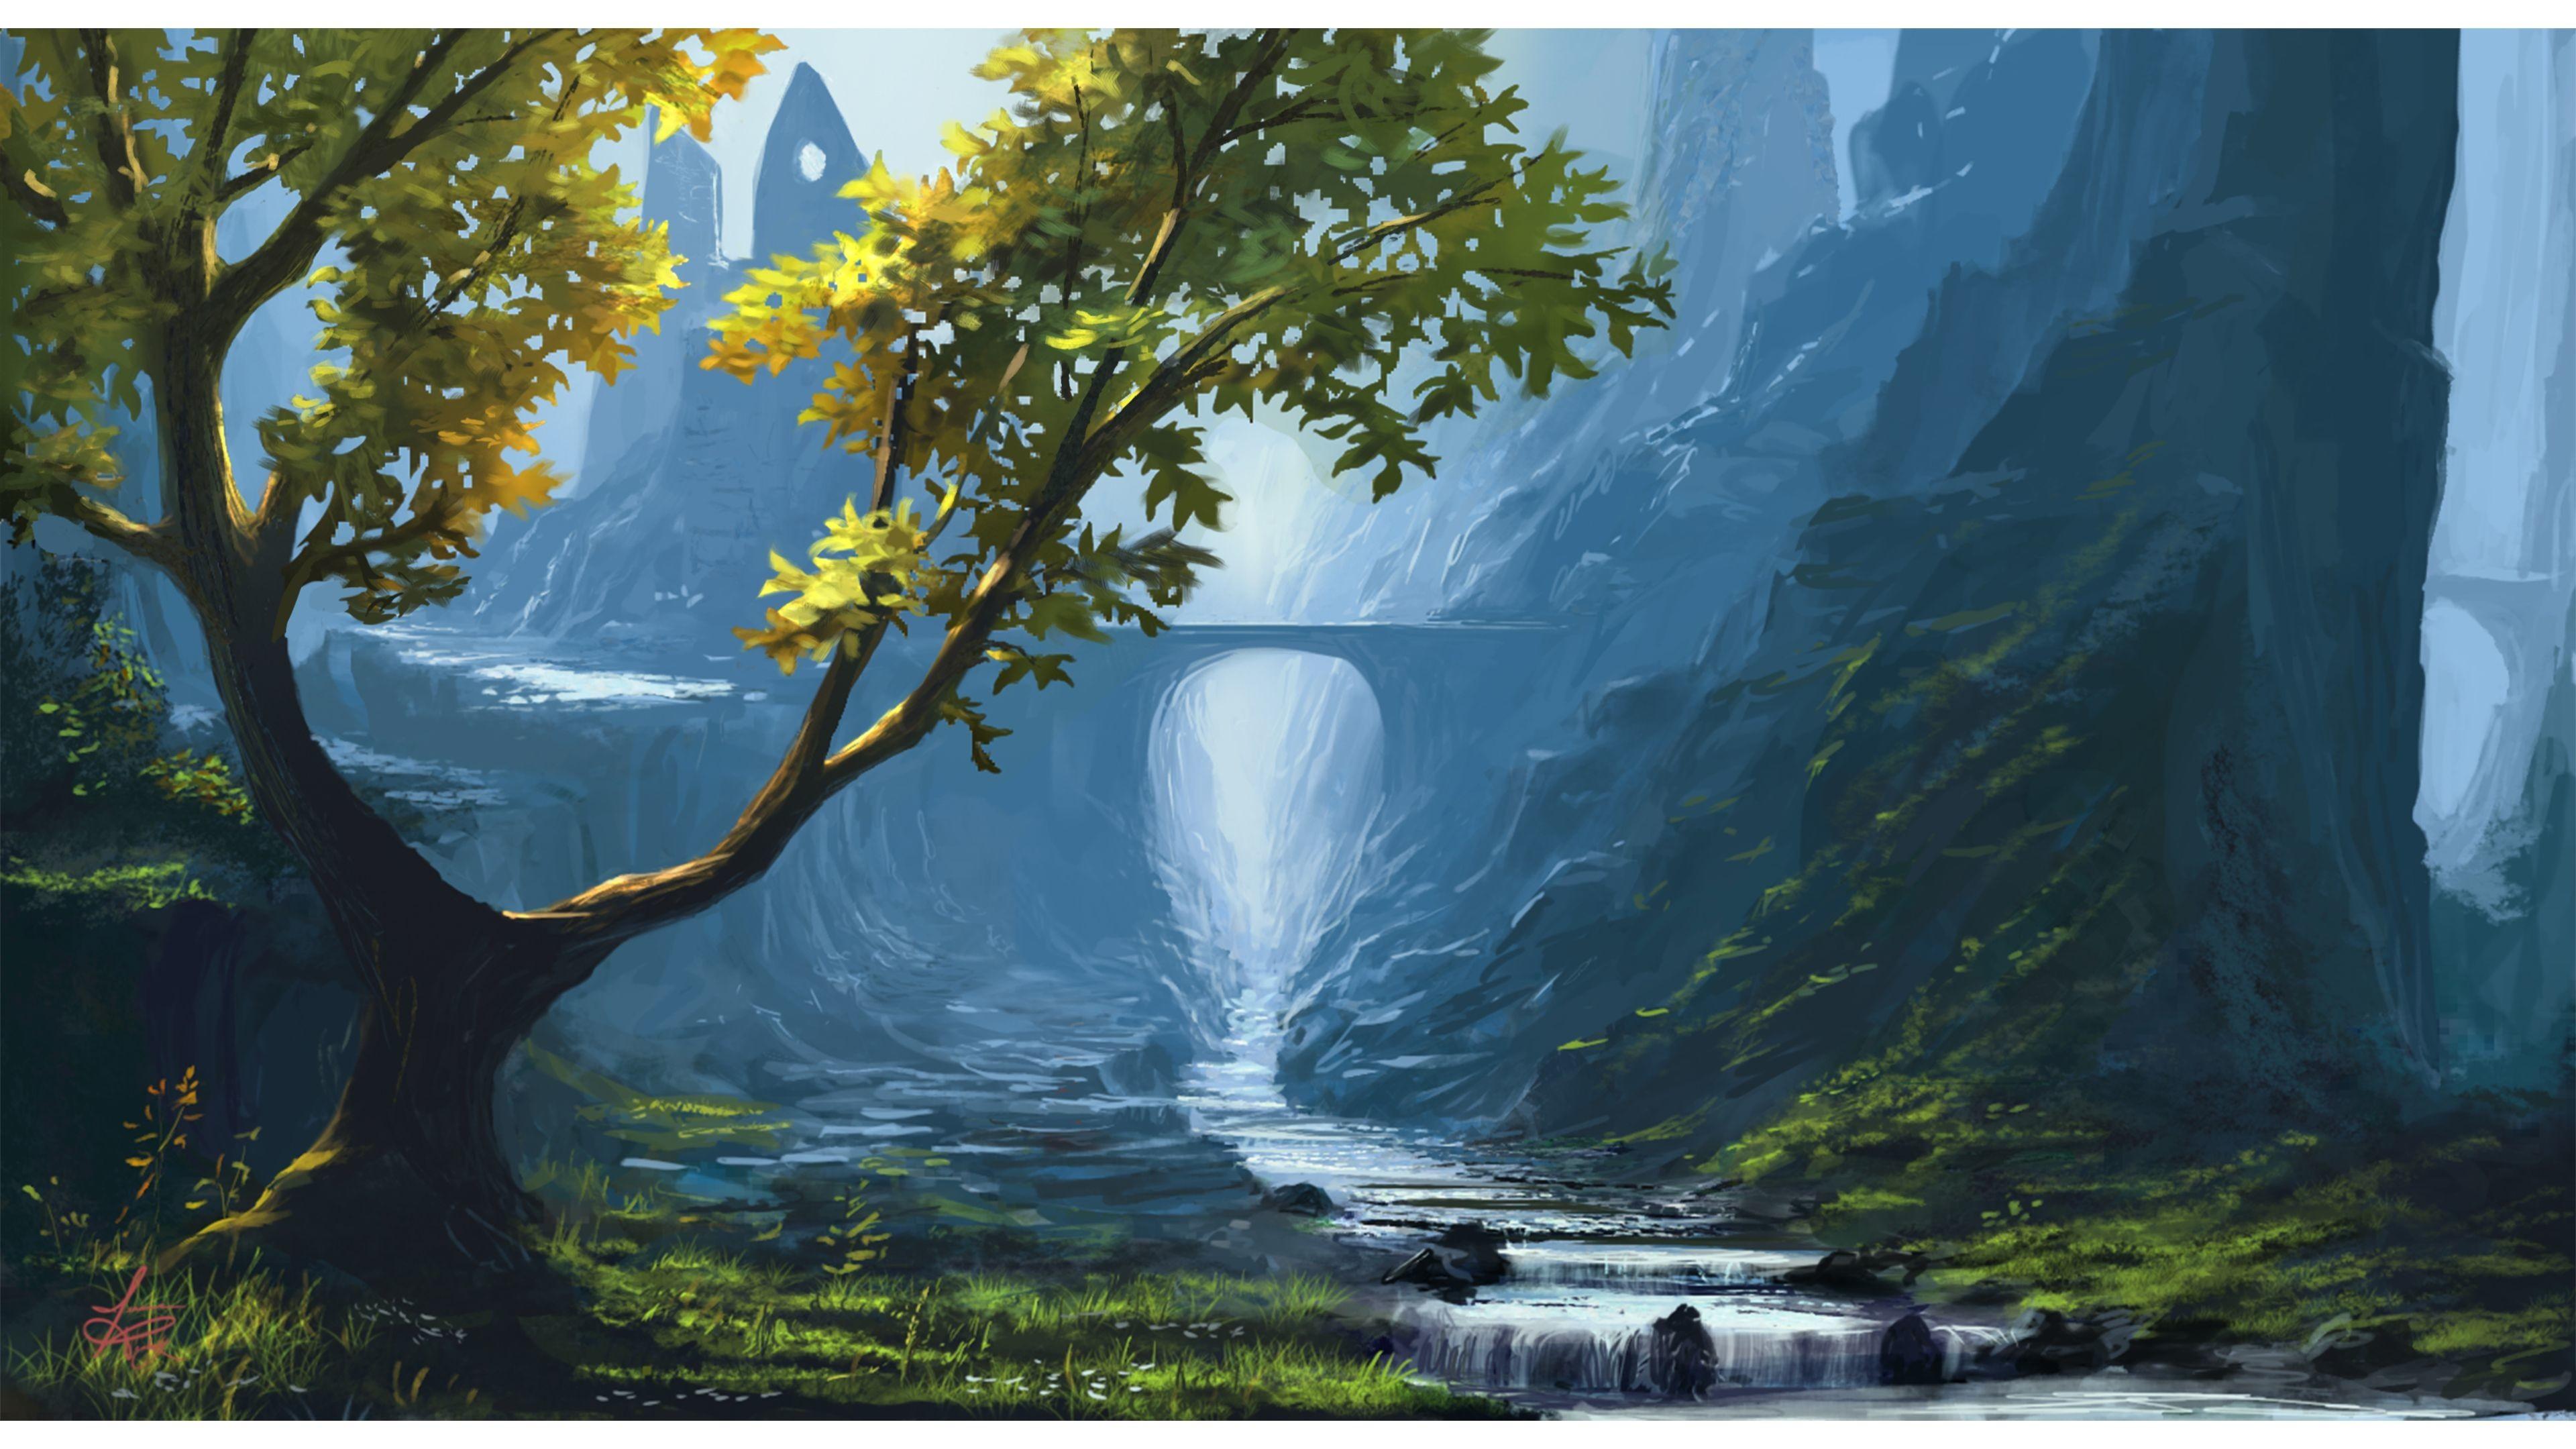 3840x2160 Fantasy 4k Nature Wallpaper Beautiful Natural Scenery Art 3840x2160 Wallpaper Teahub Io